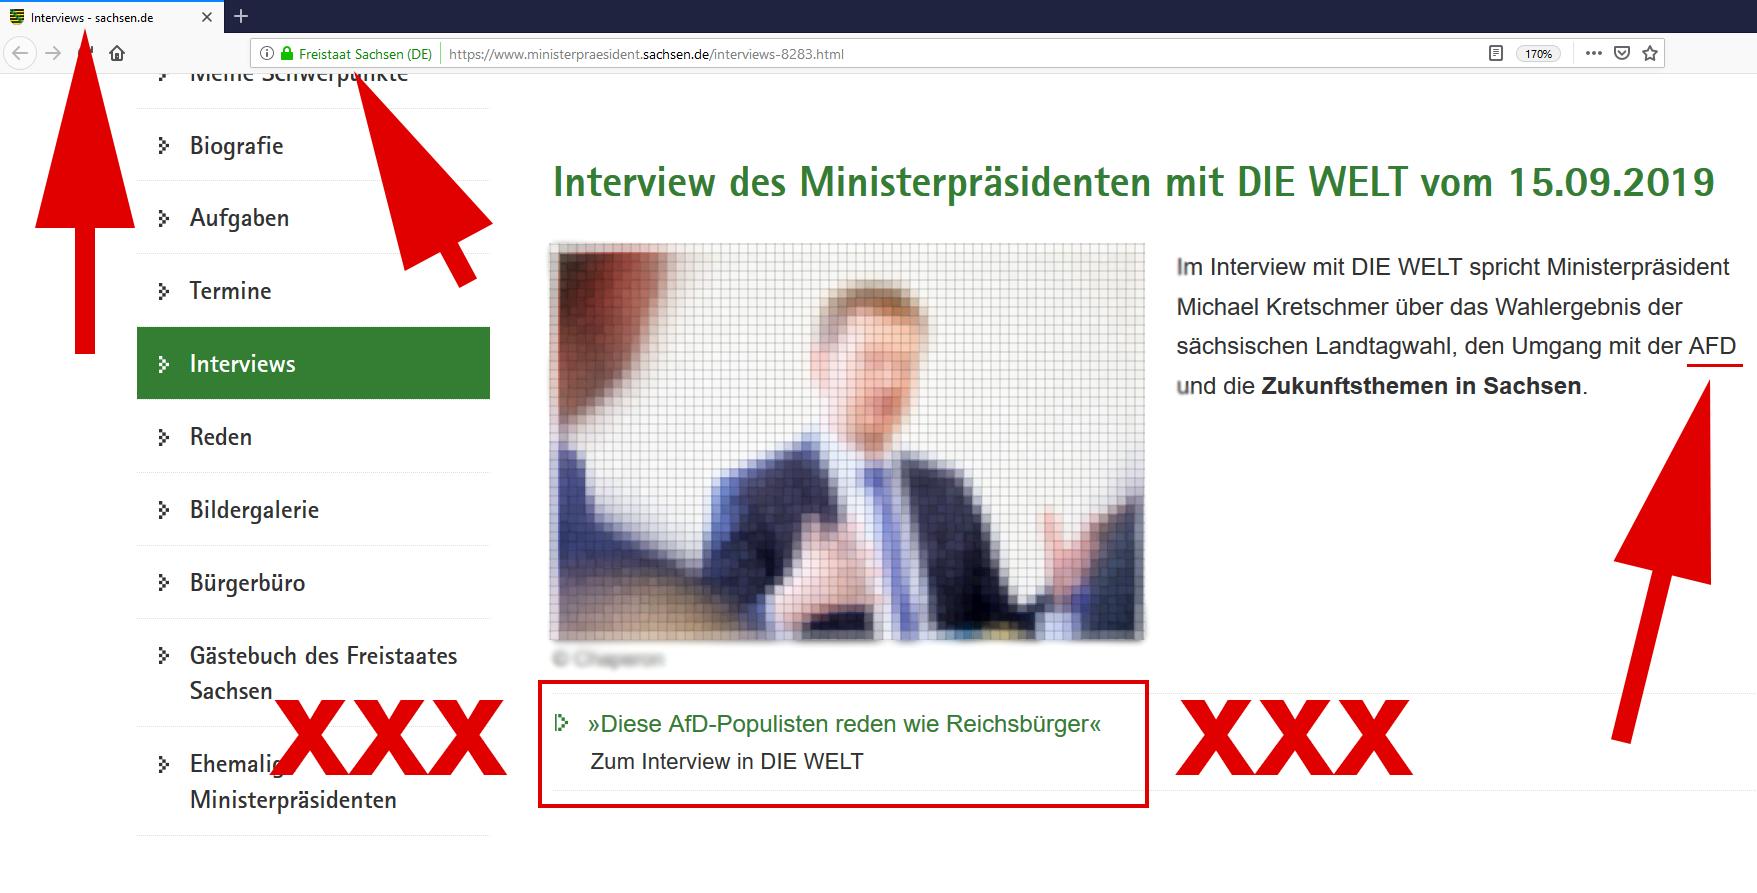 Seehofer 2.0: Kretschmer pöbelt gegen AfD / Wir prüfen juristische Schritte!